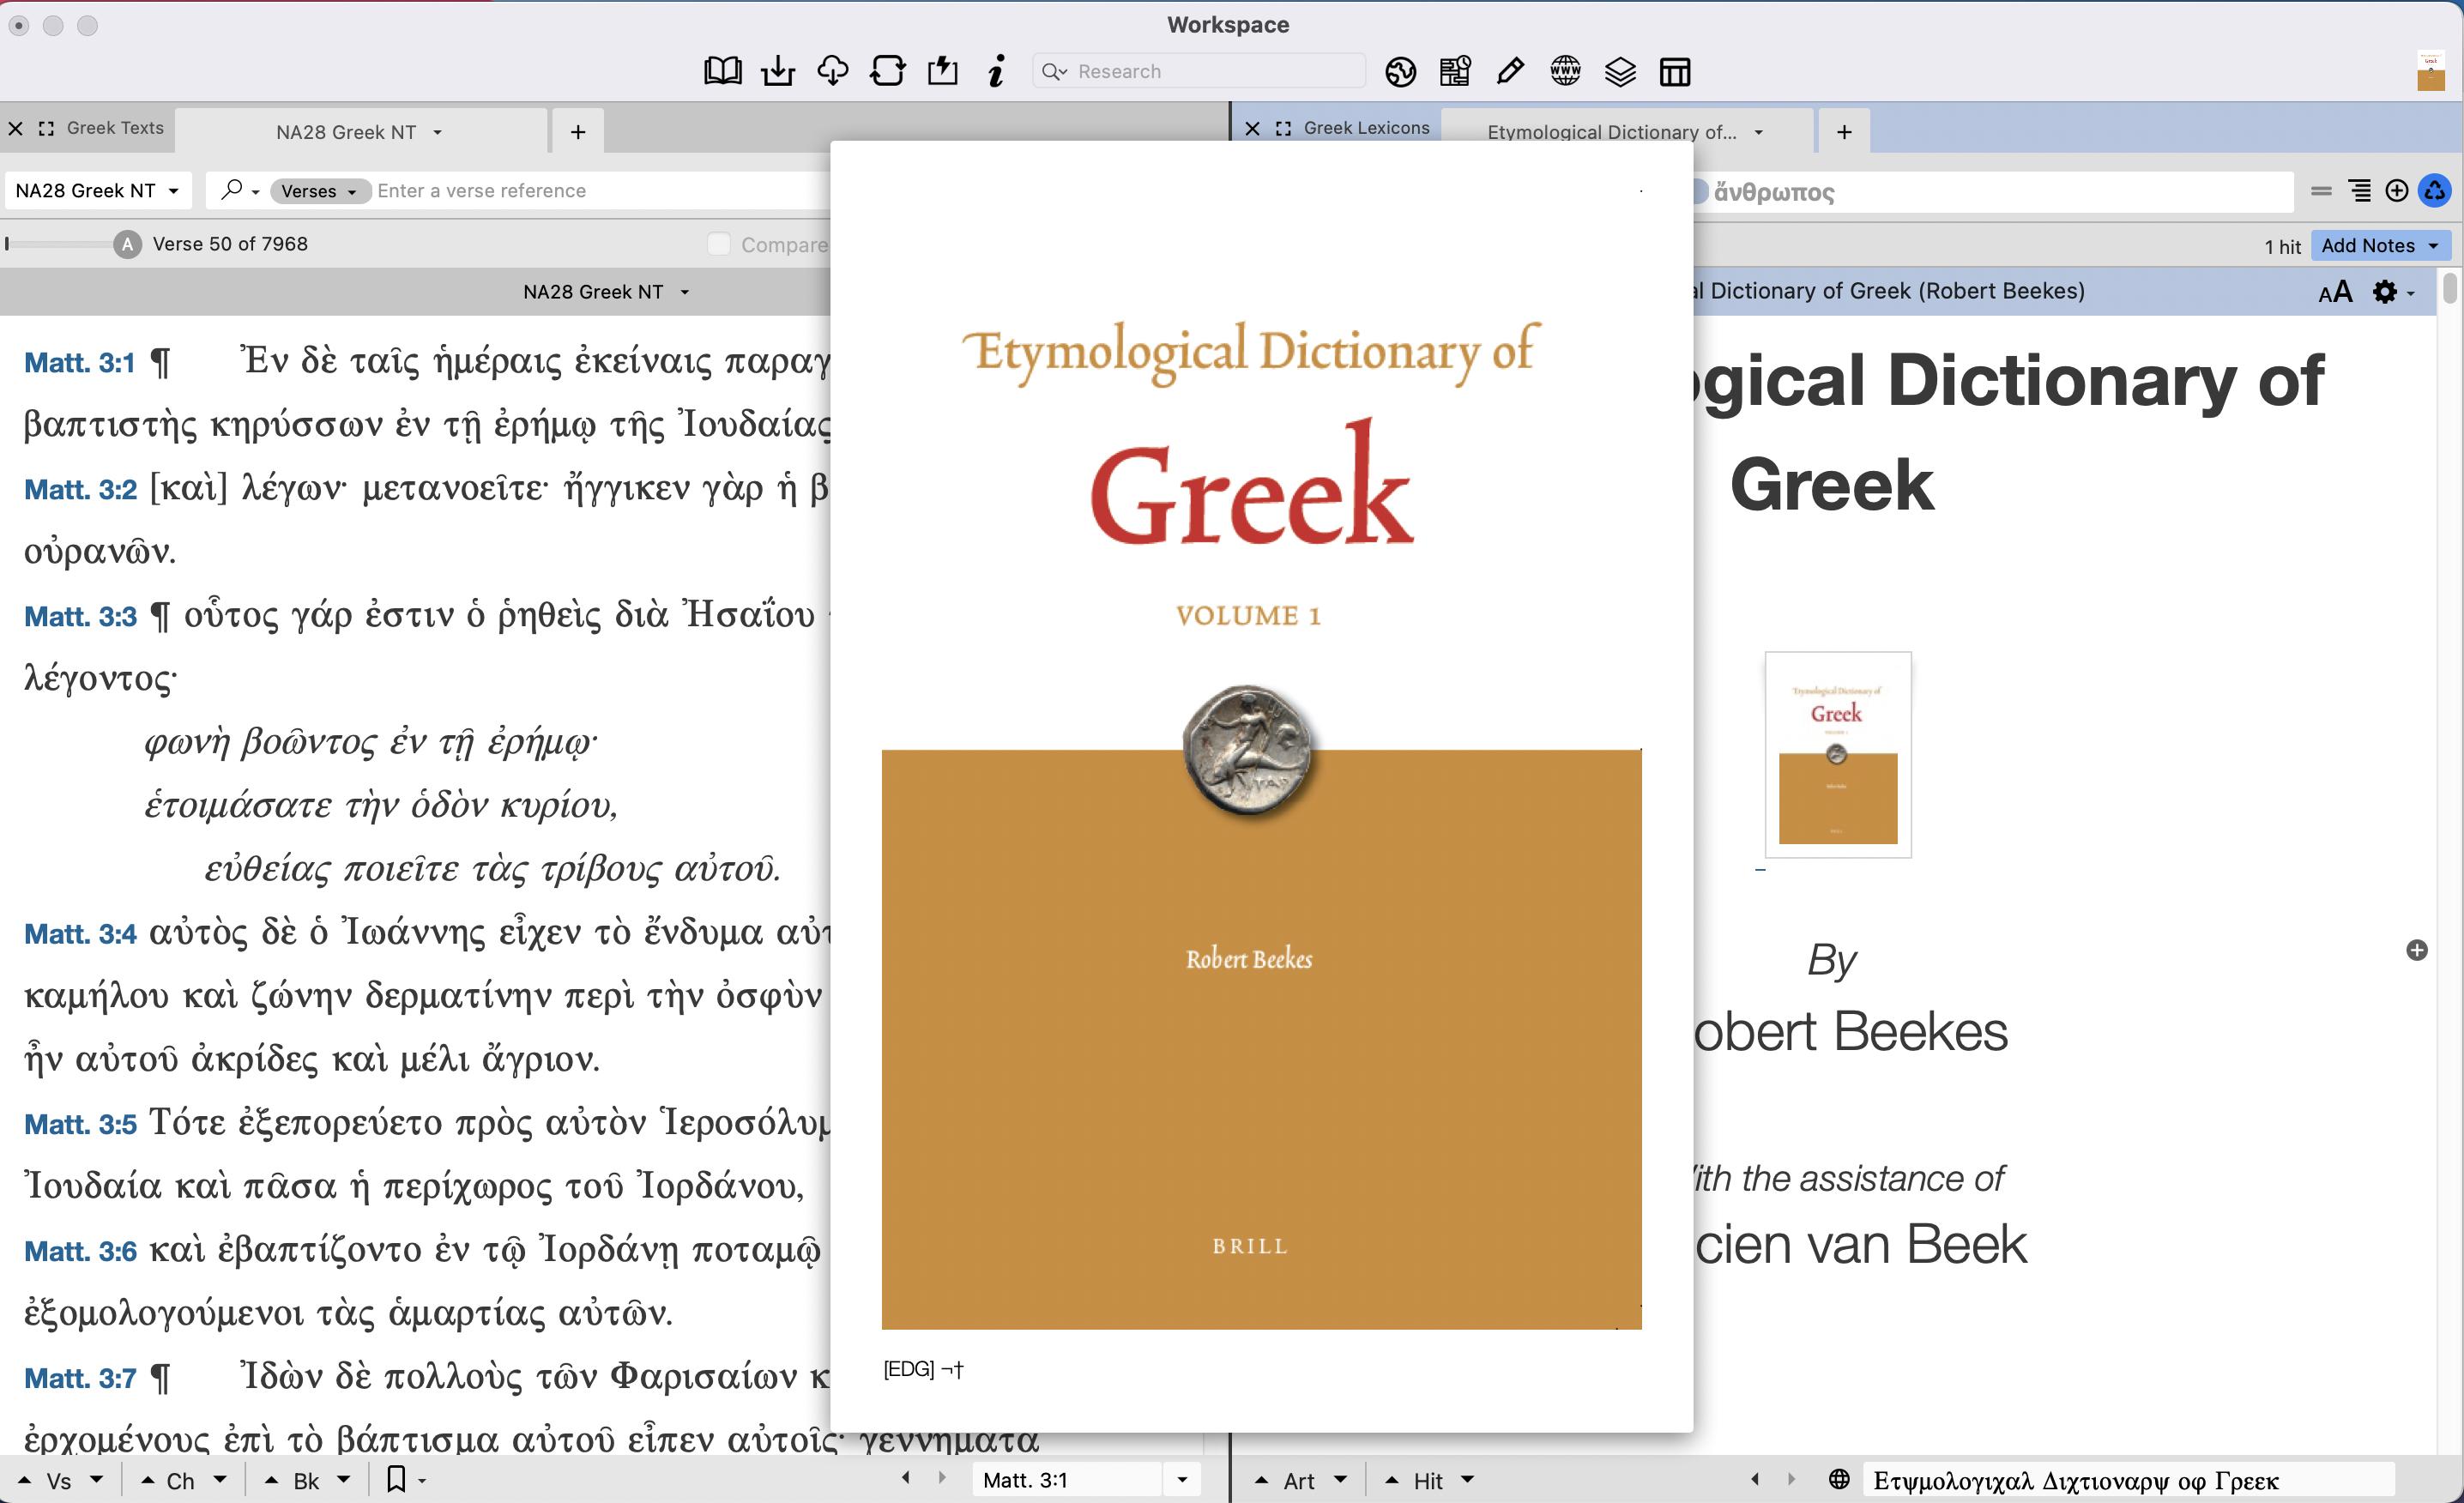 Beekes' Etymological Dictionary of Greek in Accordance